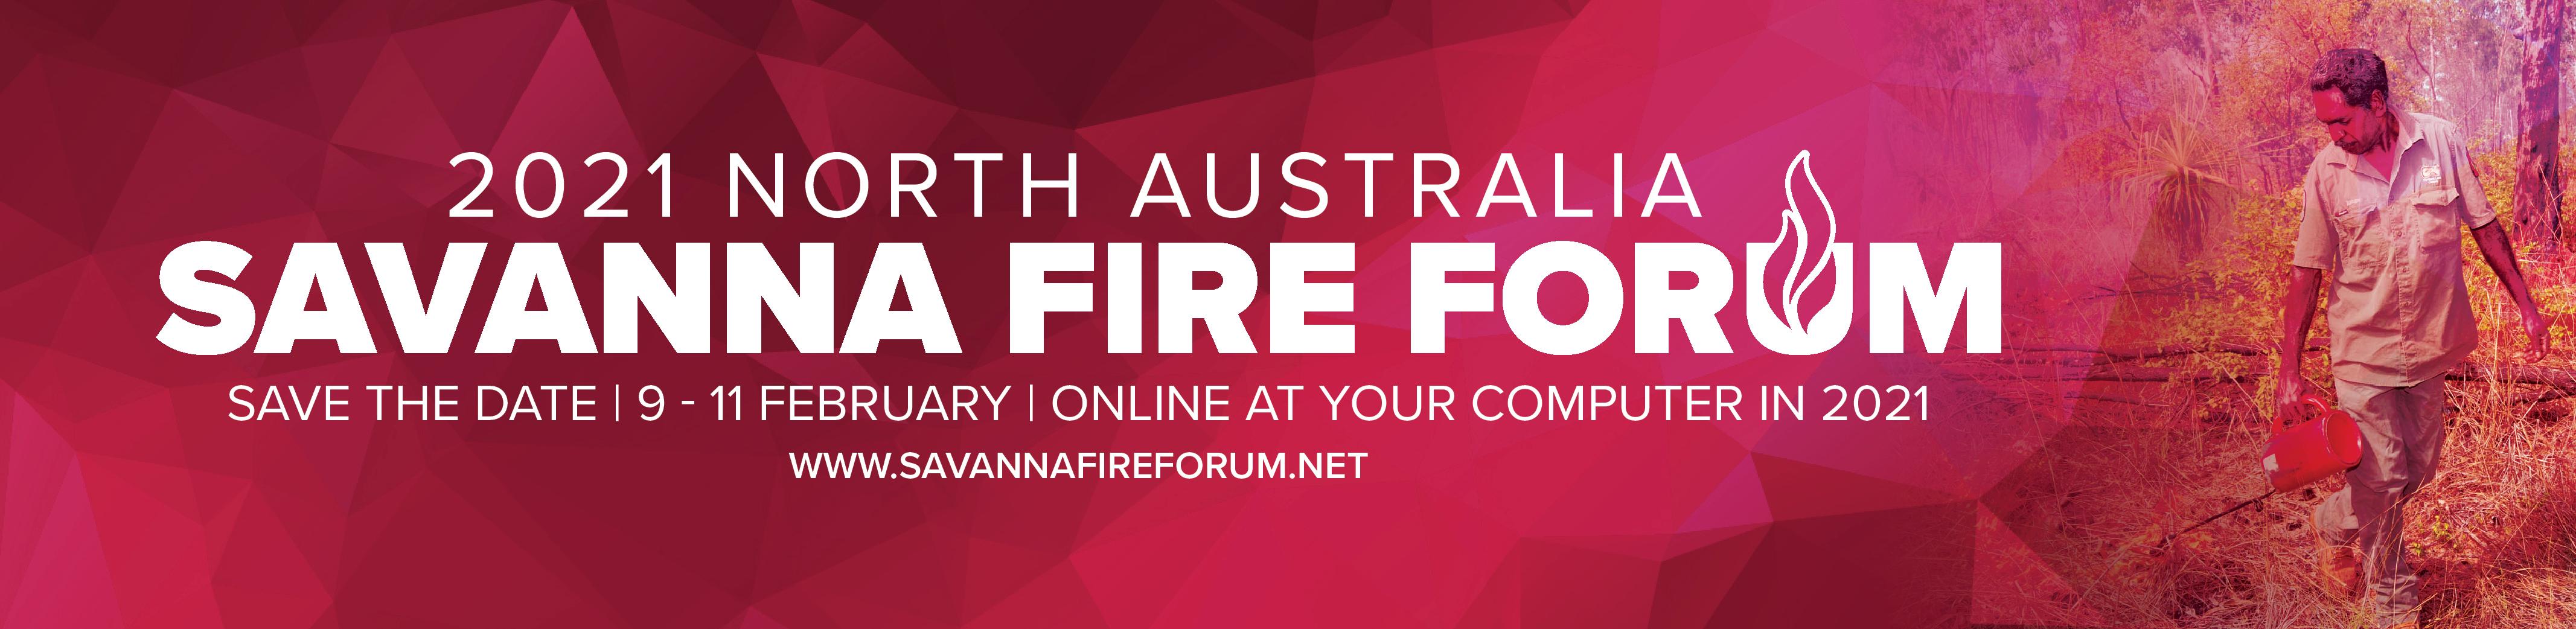 2021 North Australia Savanna Fire Forum